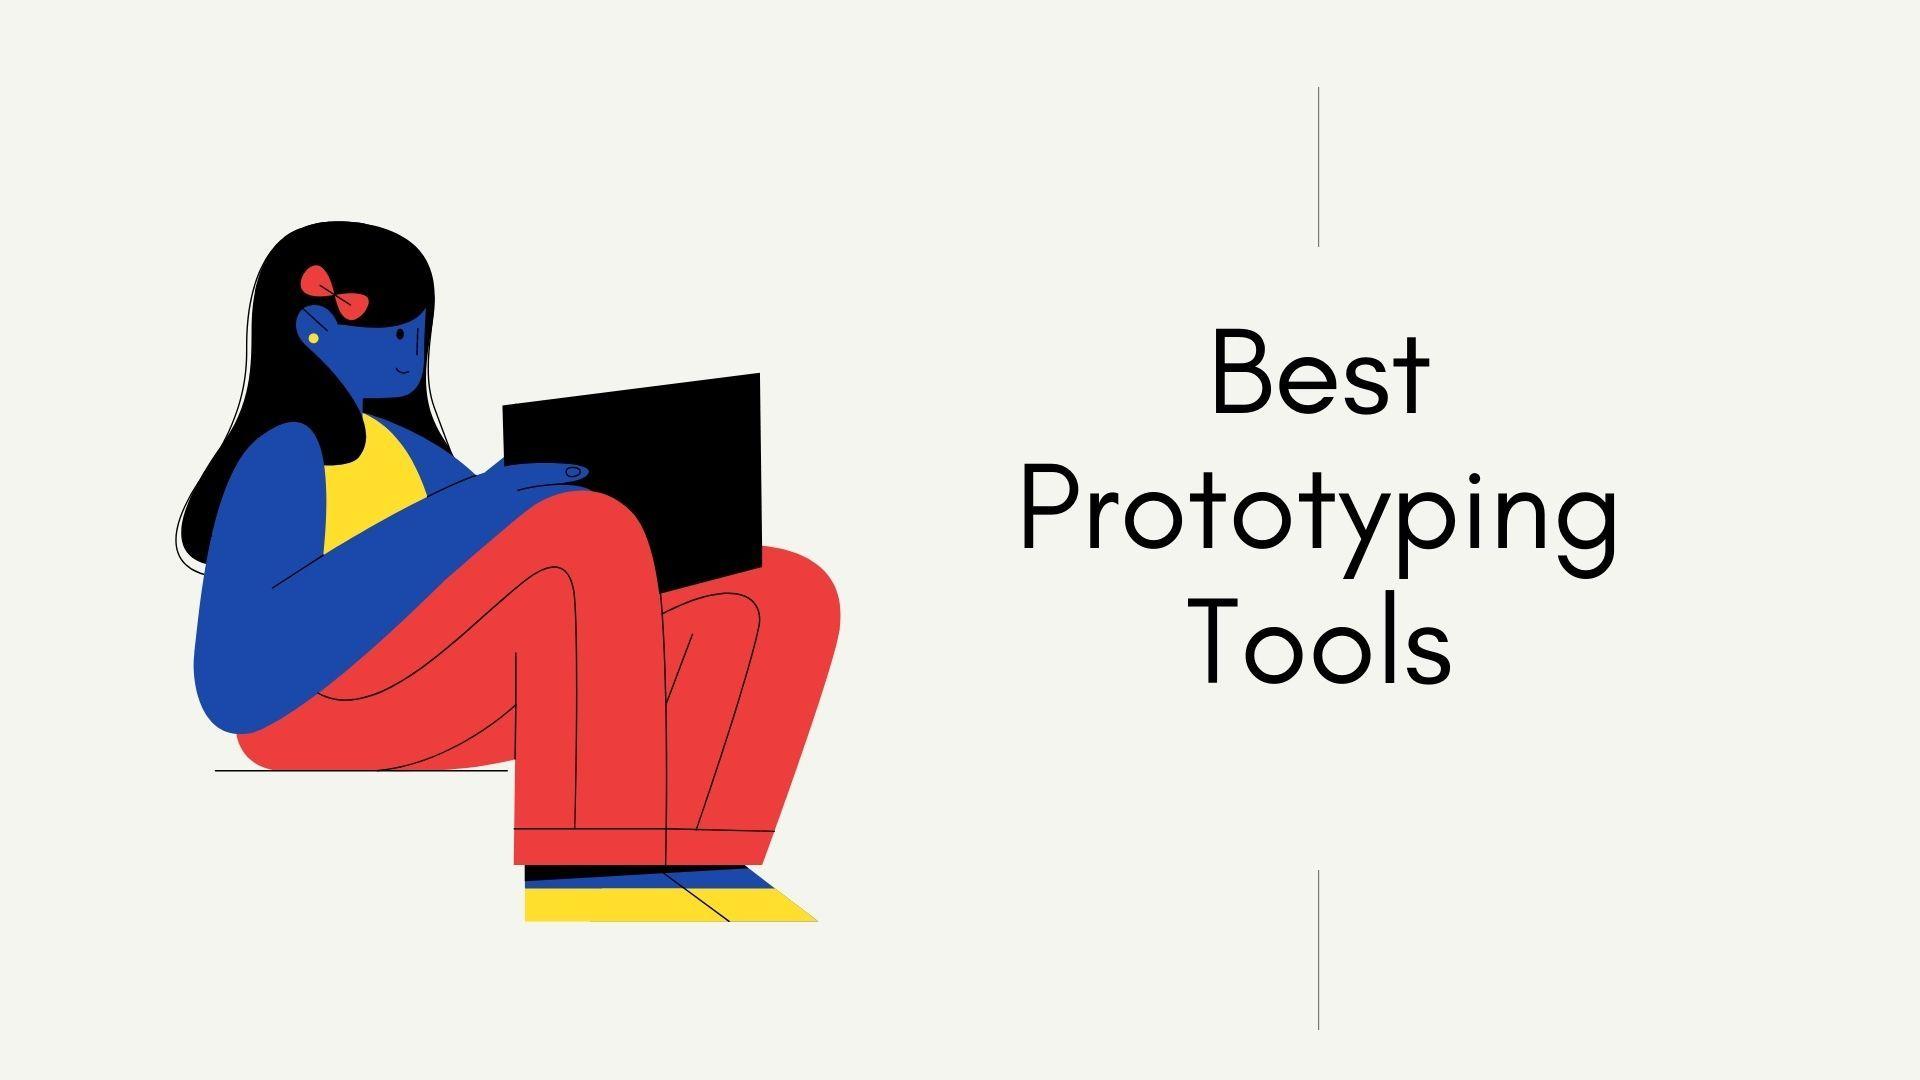 5 Best Prototyping Tools